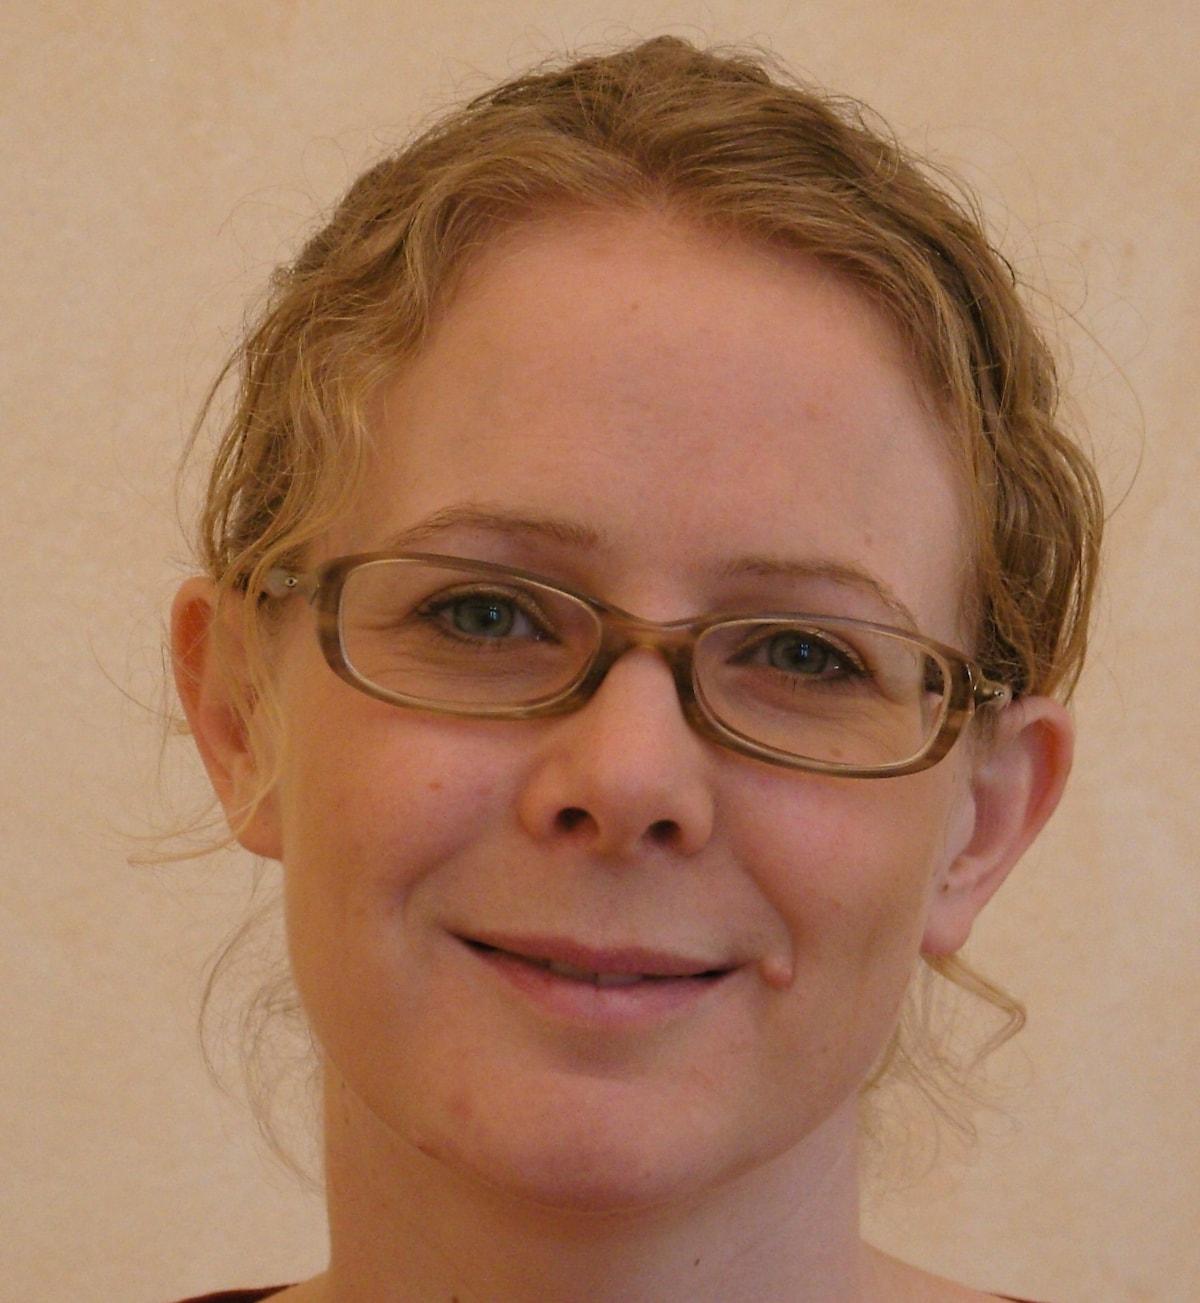 Sonja from Bremen